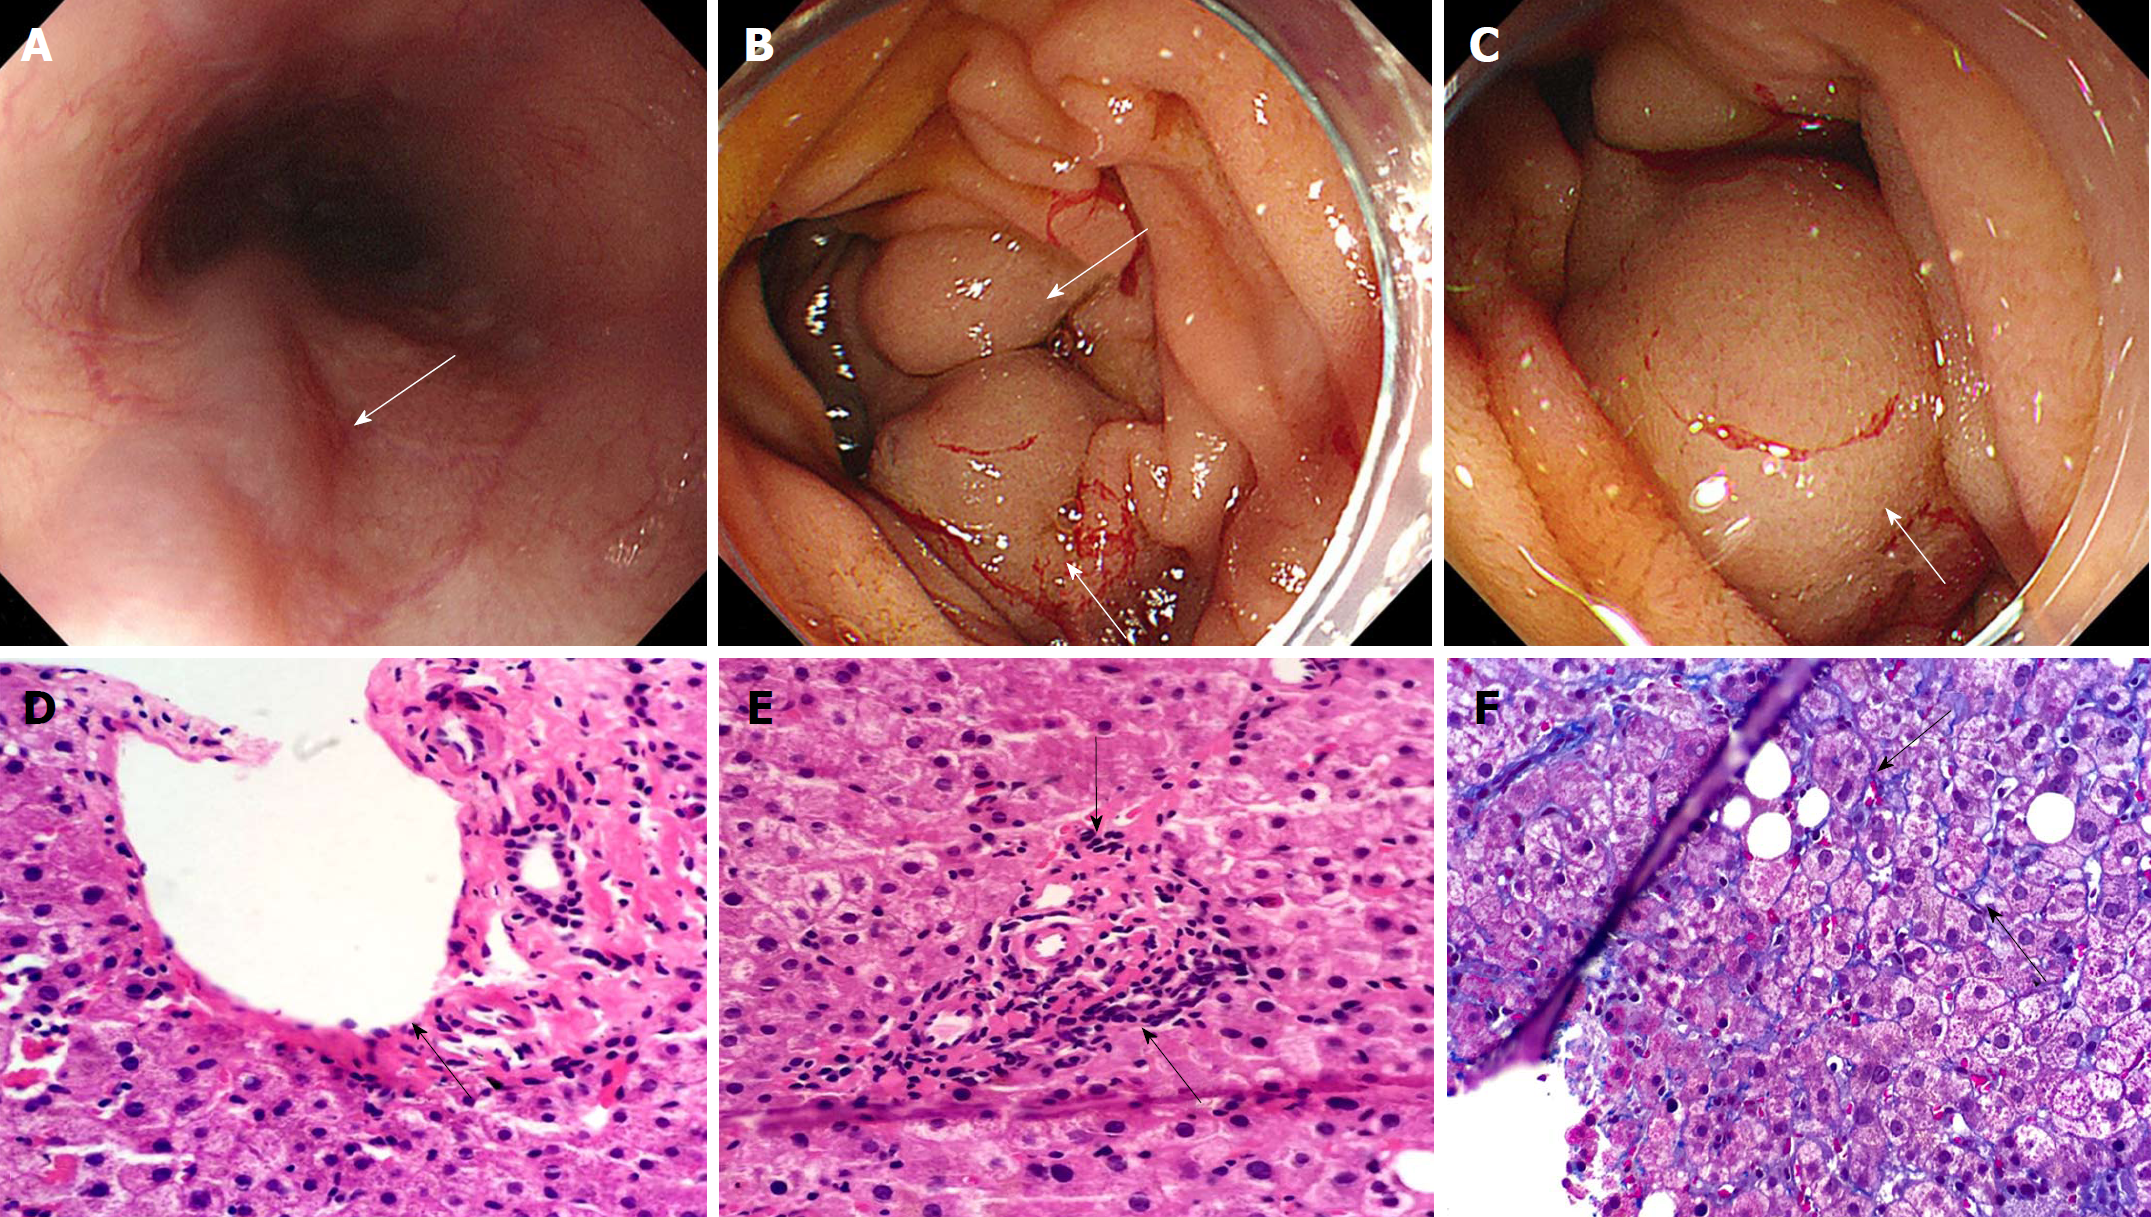 Duodenal variceal bleeding secondary to idiopathic portal